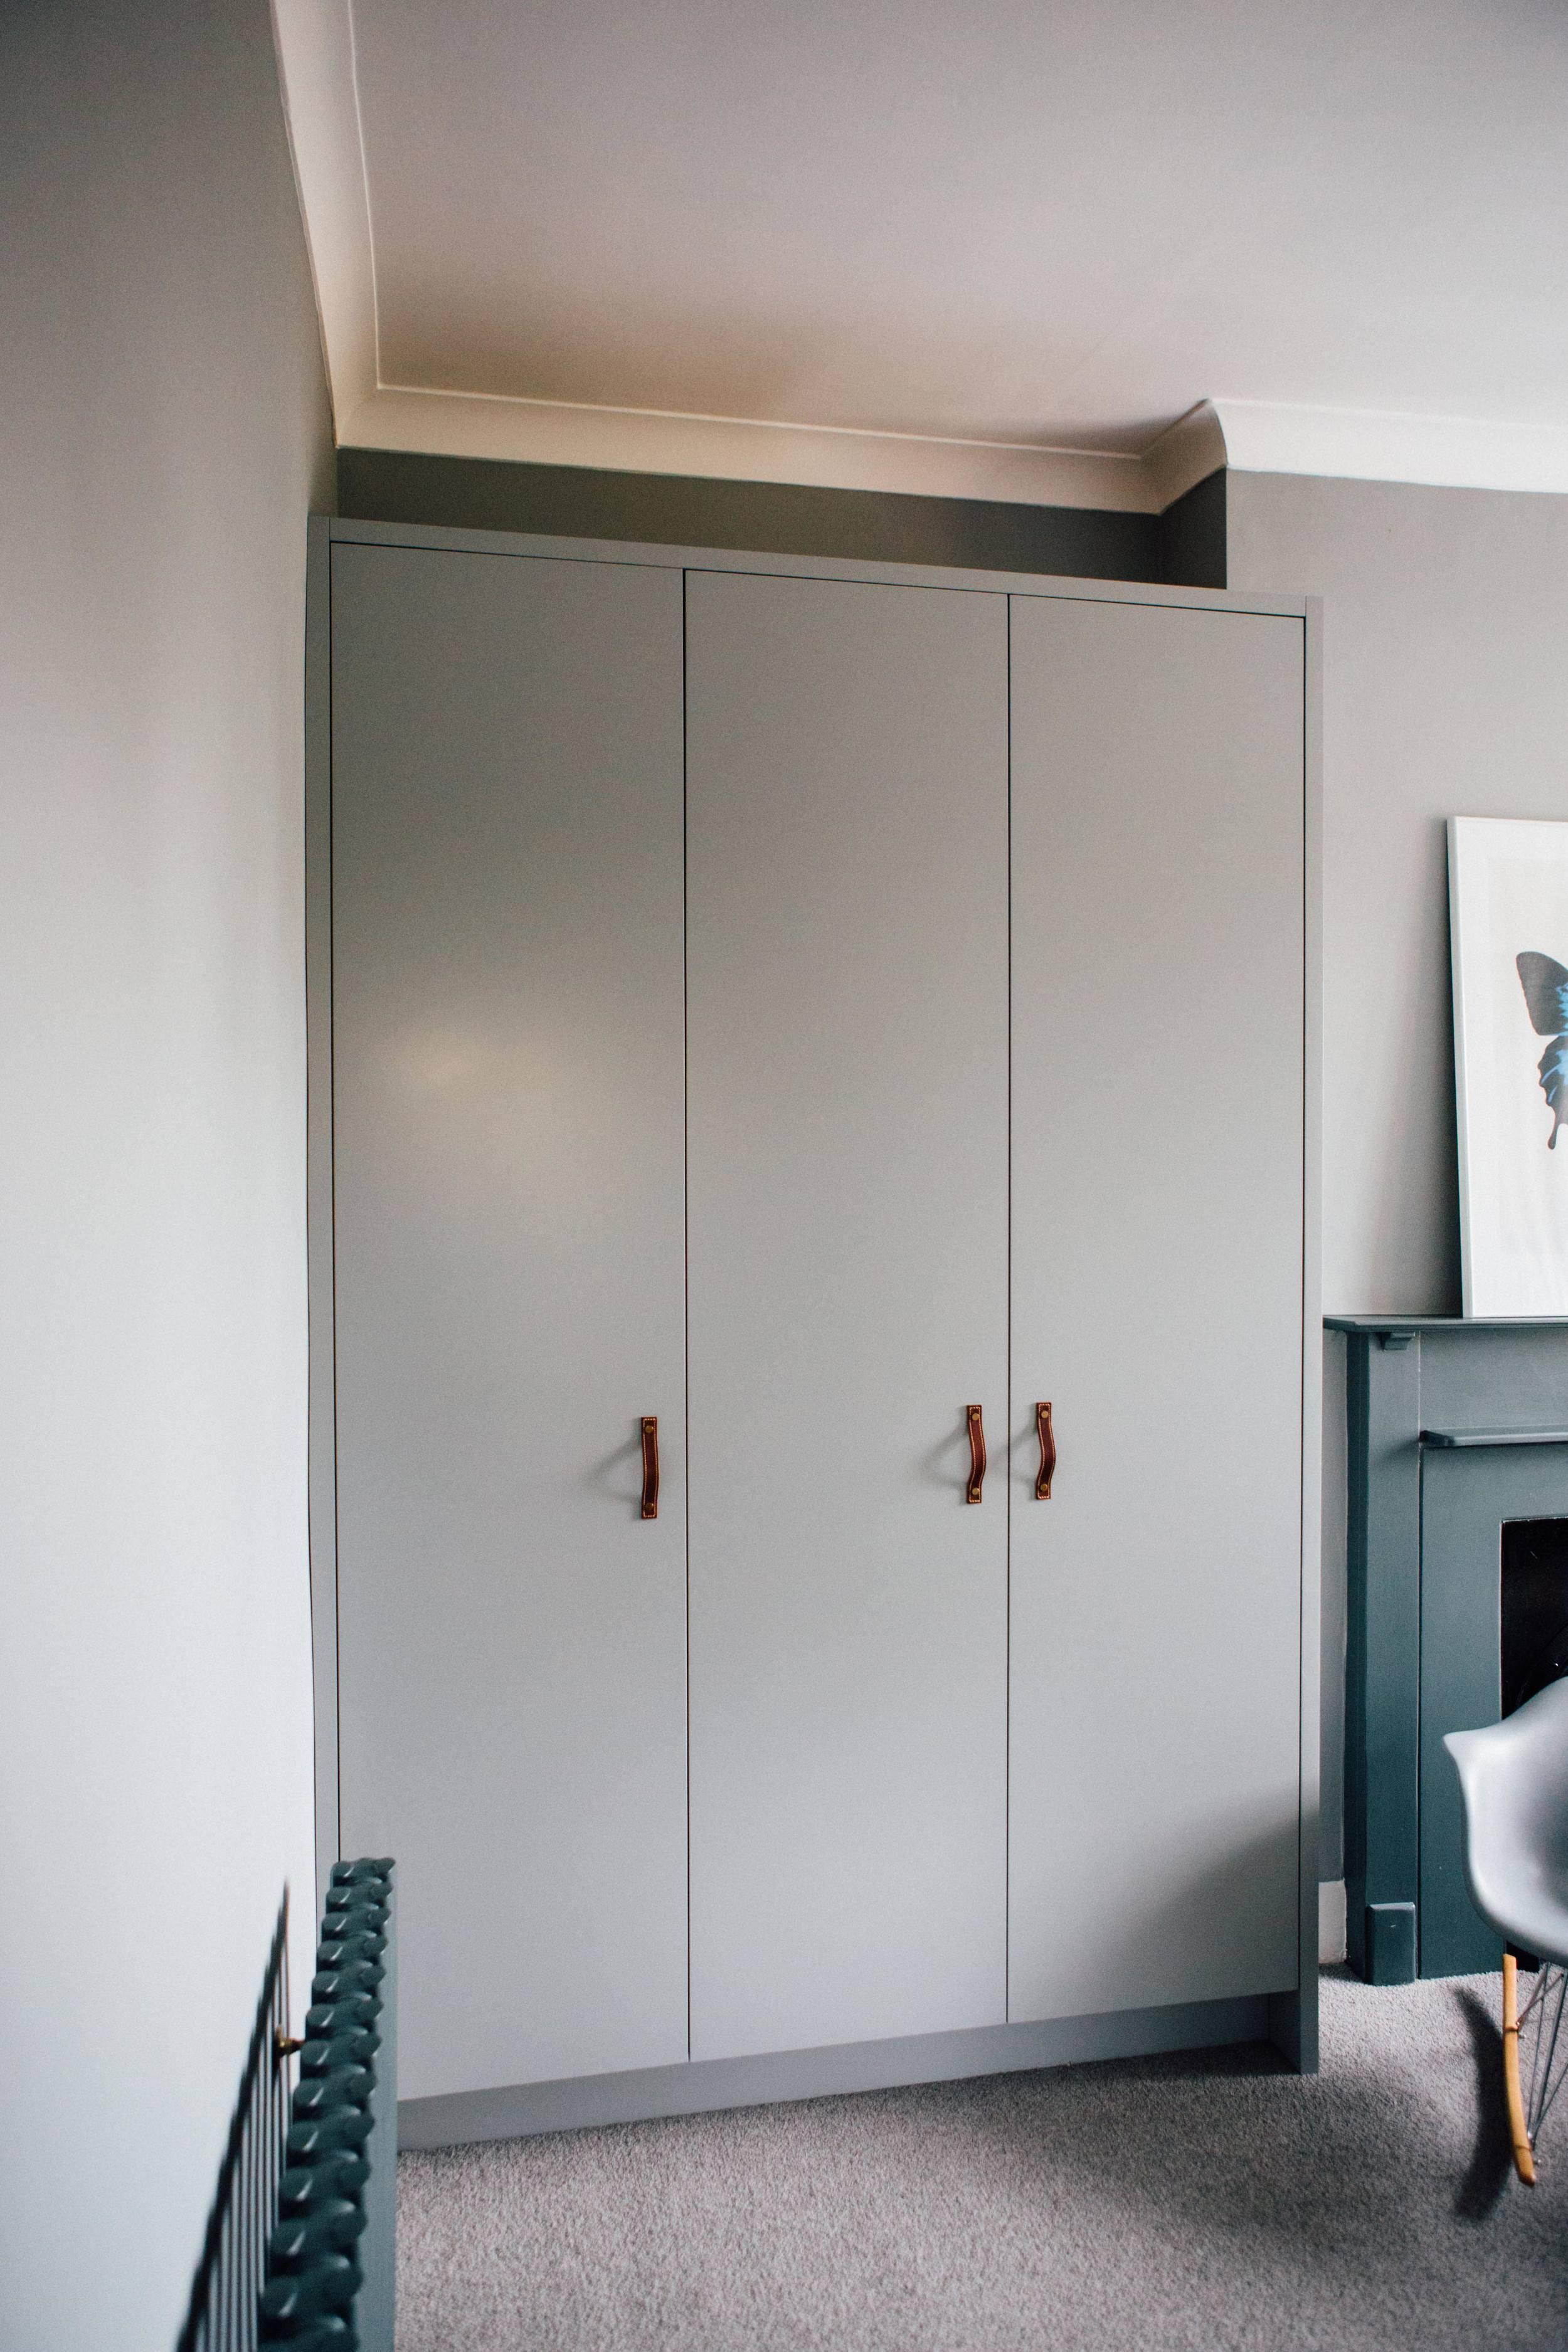 Carpenter Herne Hill Bespoke Wardrobe - West & Reid